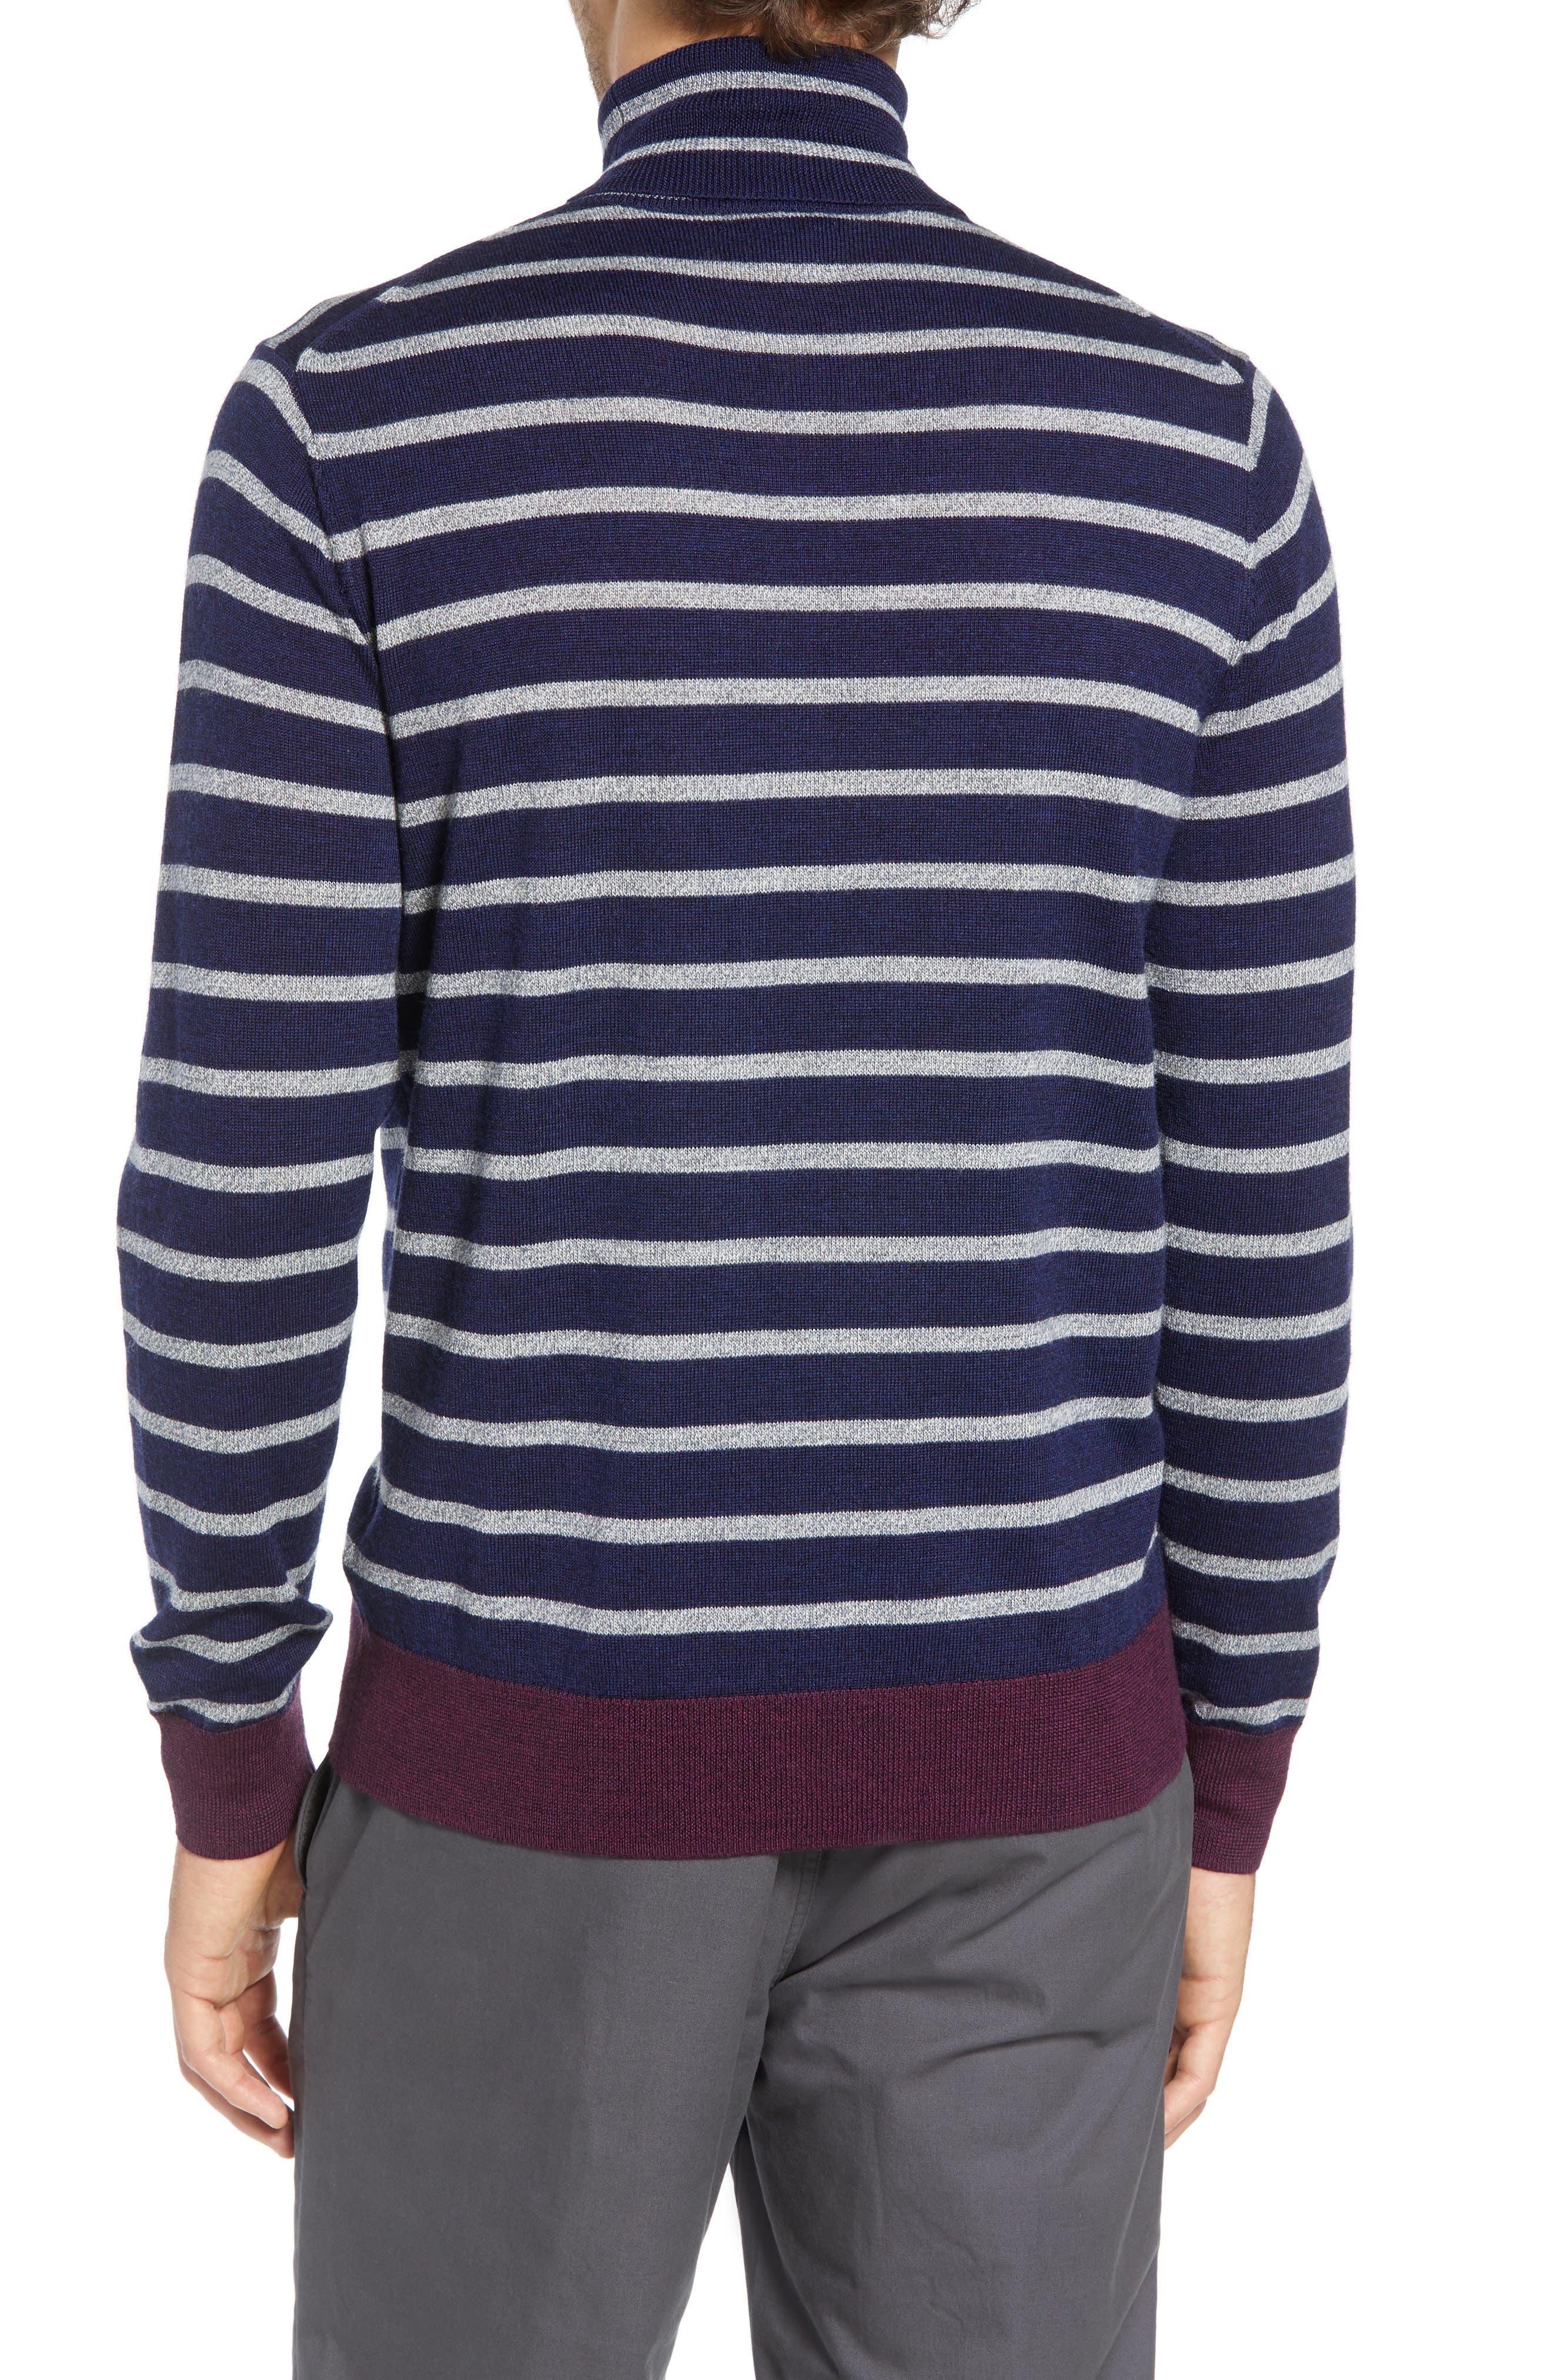 Slim Fit Turtleneck Merino Wool Sweater,                             Alternate thumbnail 2, color,                             HEATHER INK/ COOL GREY